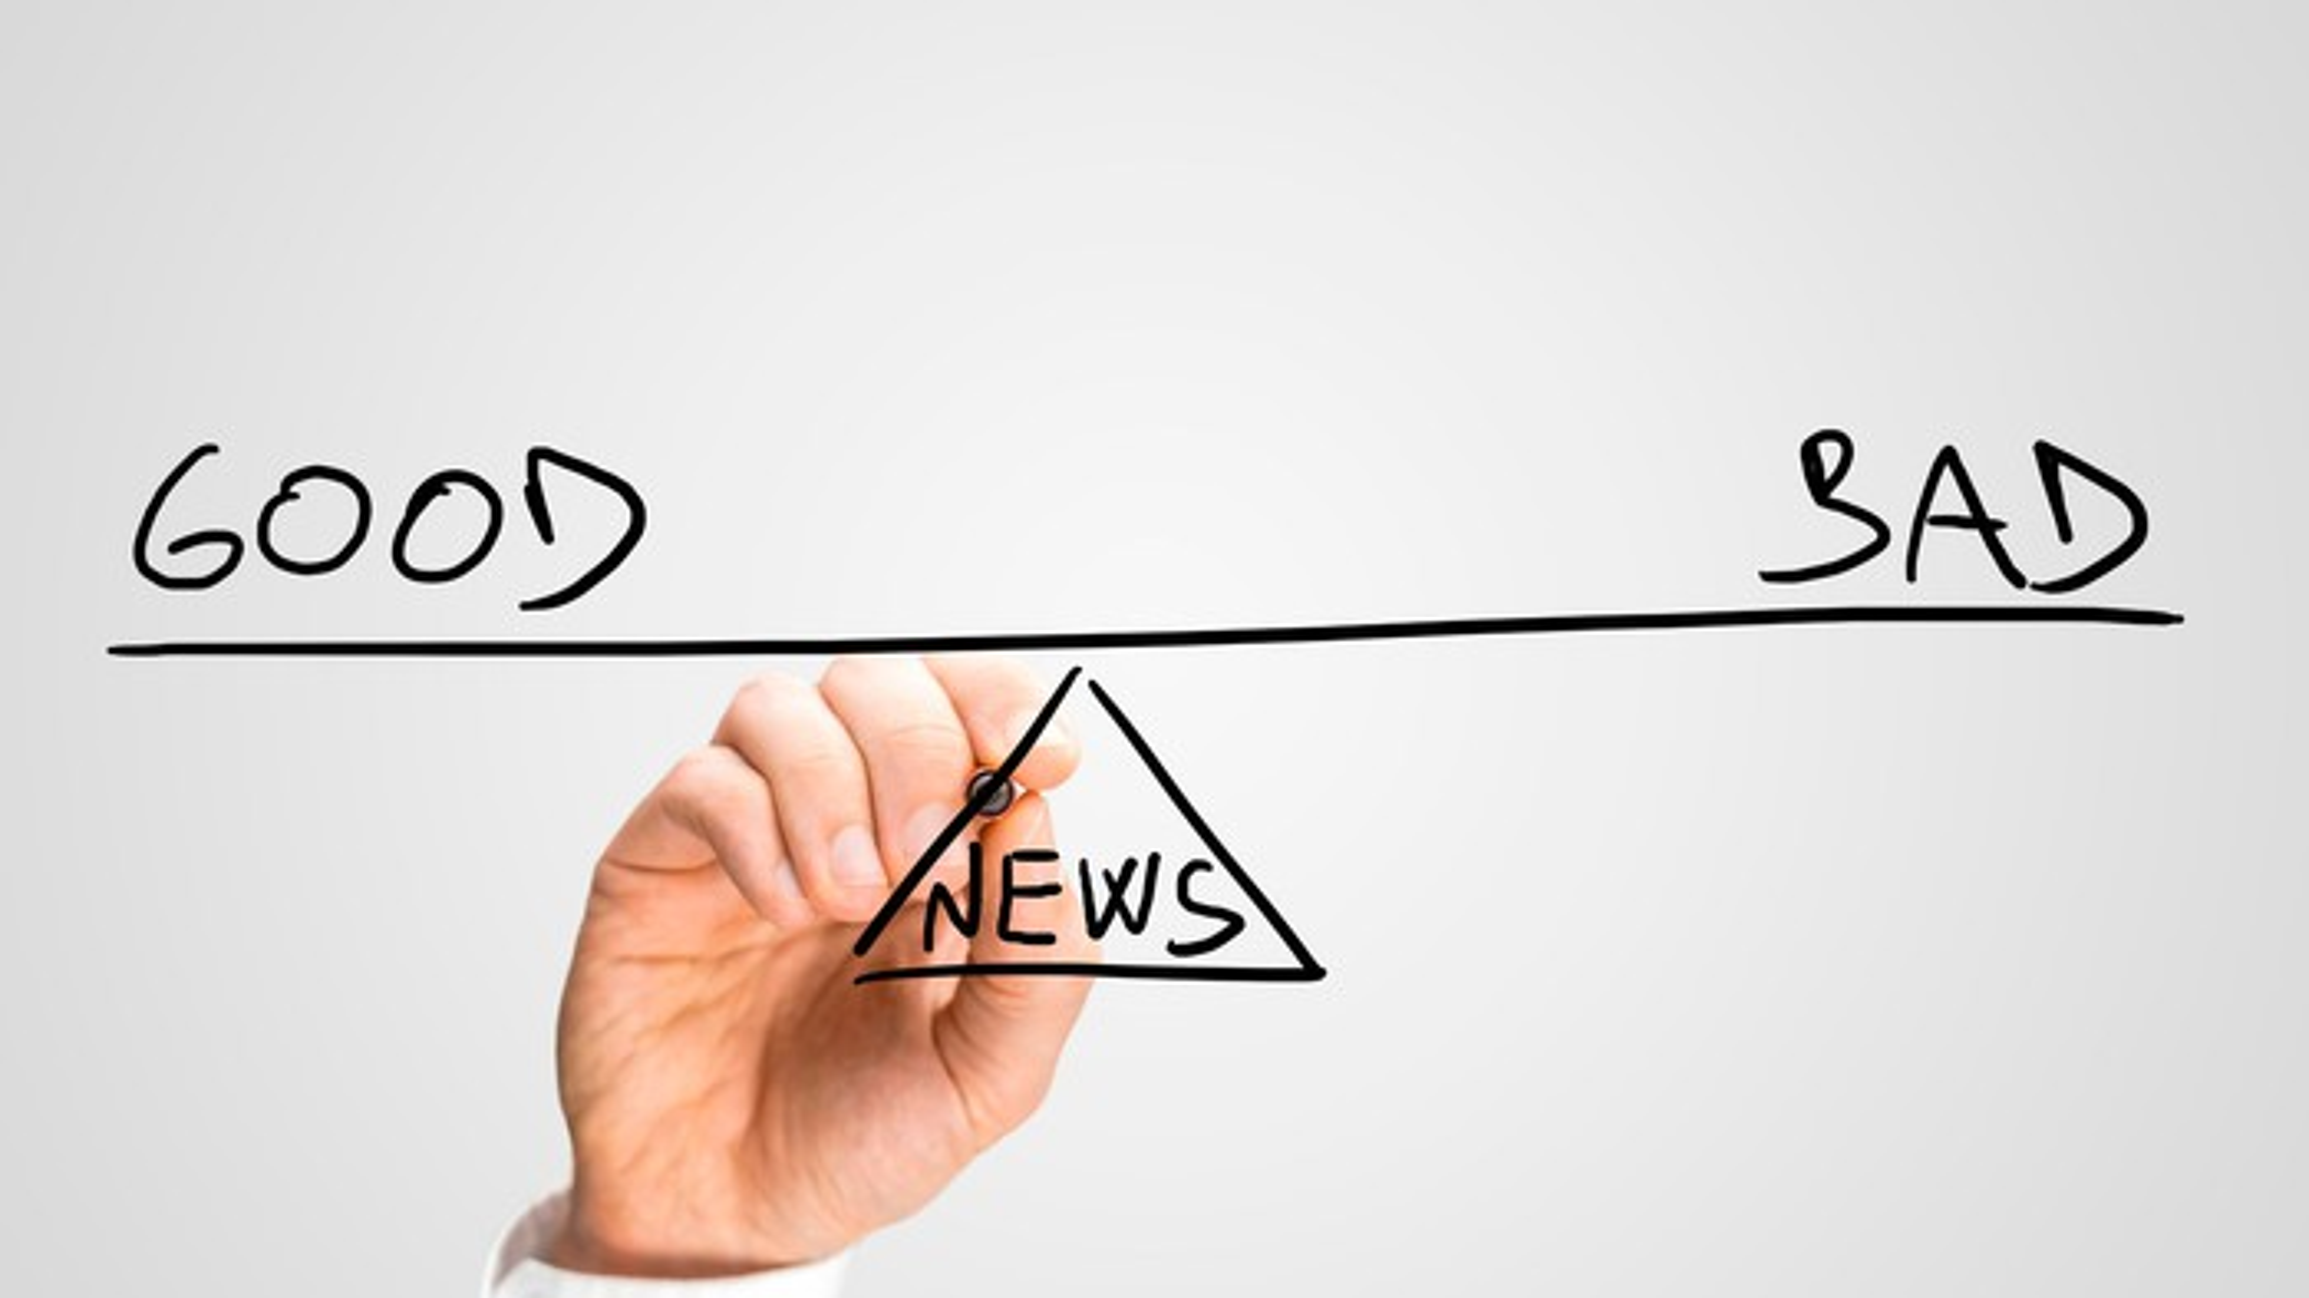 Drawing see-saw with good news and bad news